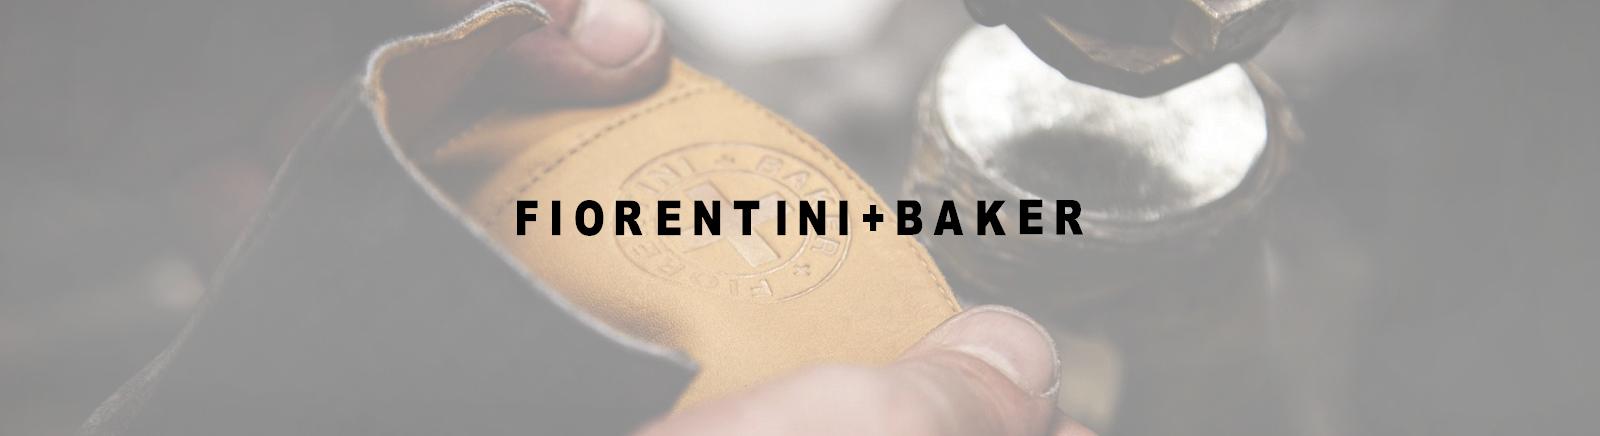 Fiorentini + Baker Herrenschuhe online bestellen im Prange Schuhe Shop